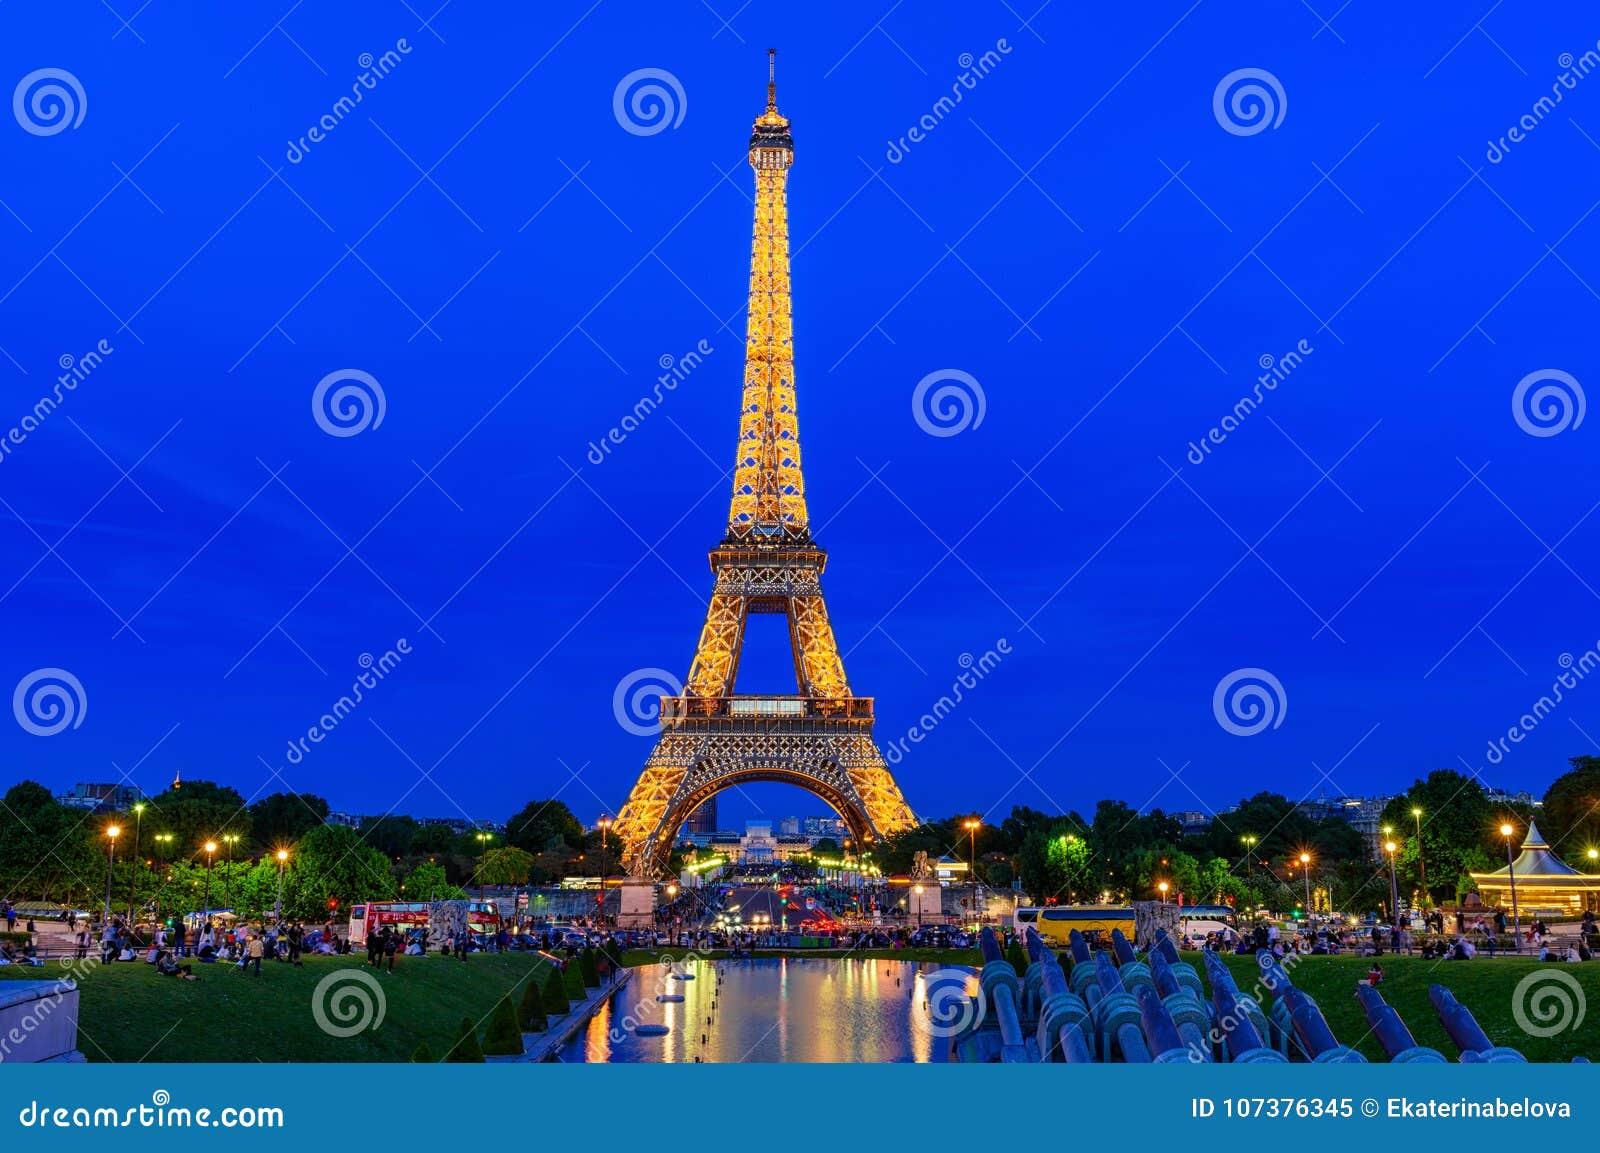 Night view of Eiffel Tower from fountain in Jardins du Trocadero in Paris, France